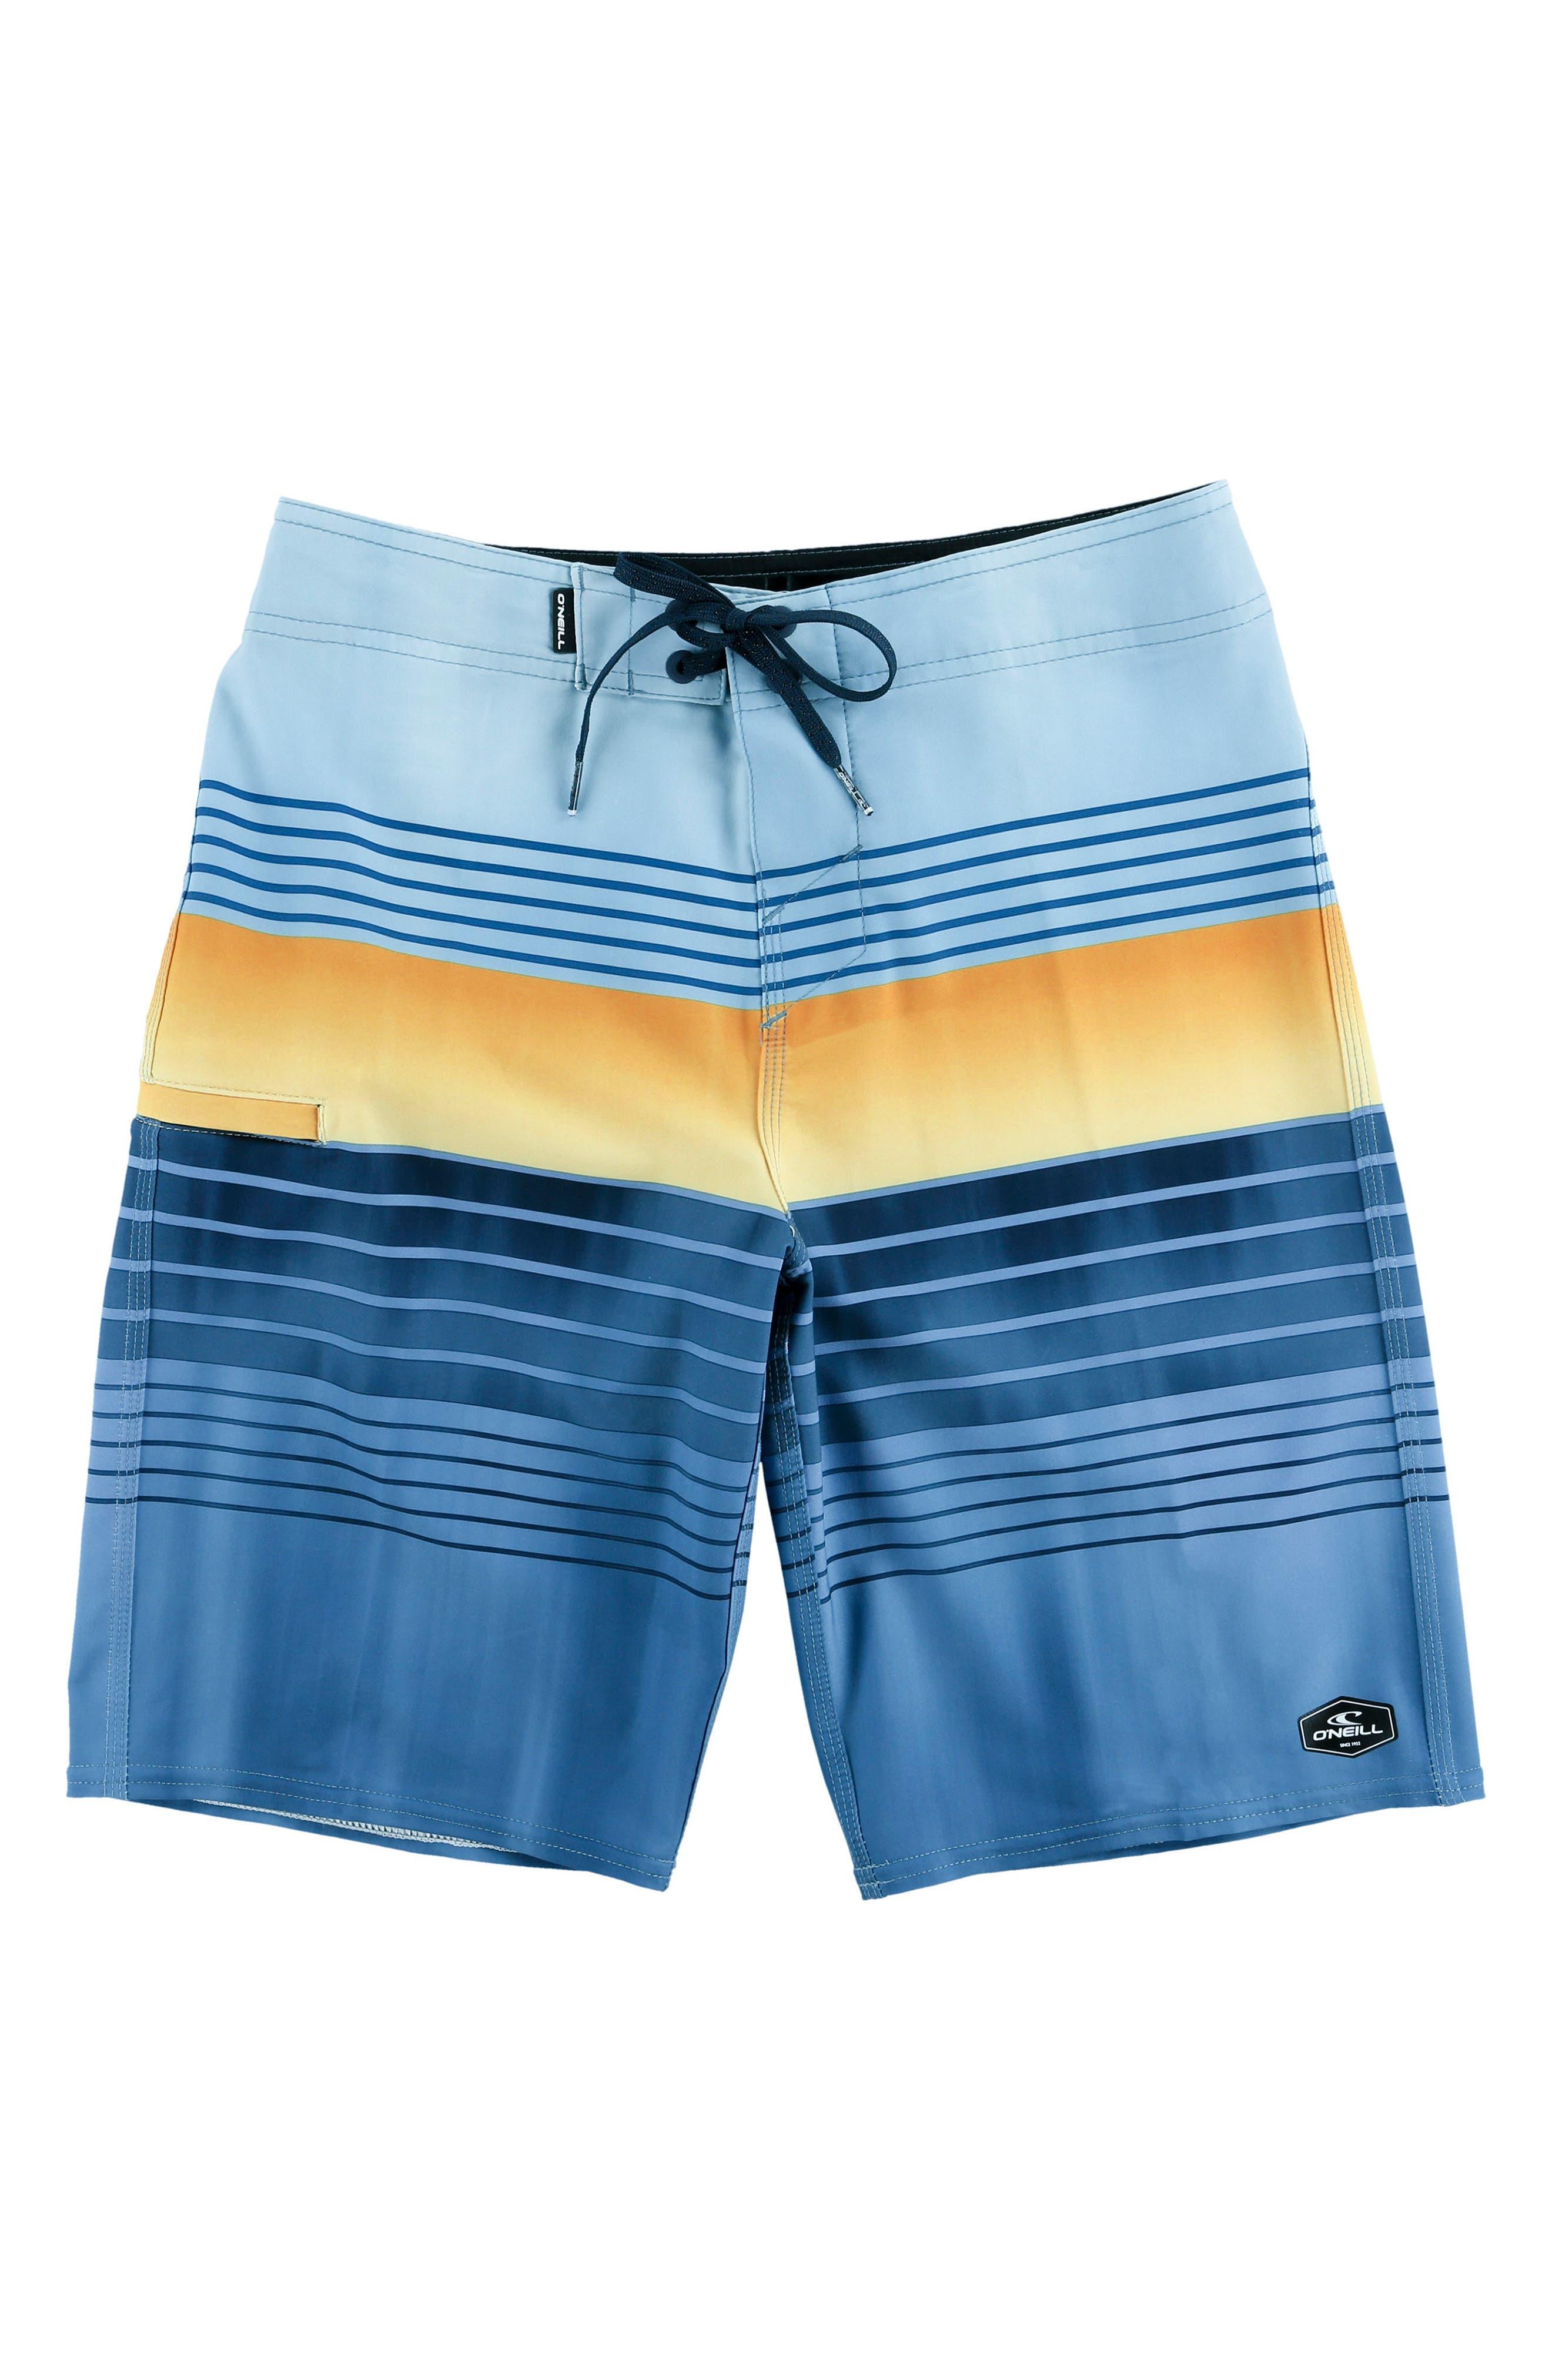 Hyperfreak Heist Board Shorts,                         Main,                         color, Harbor Blue